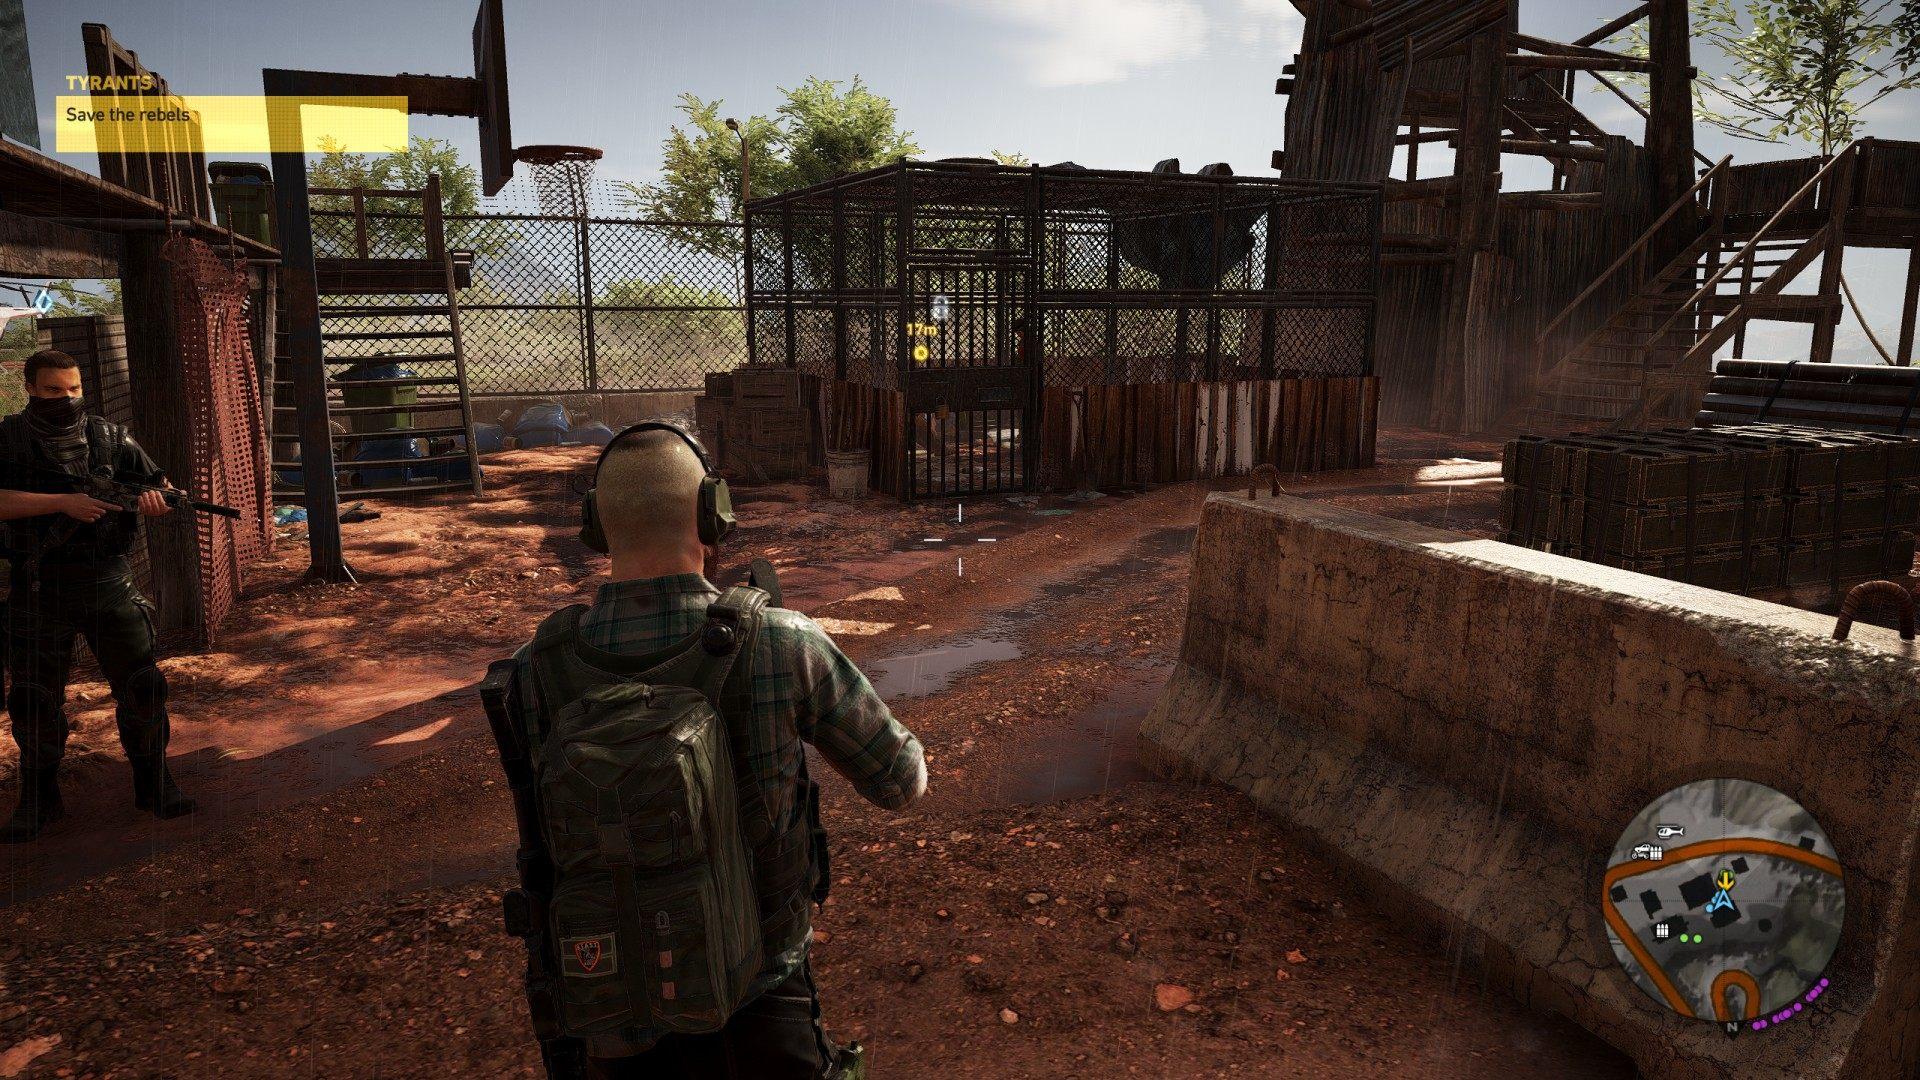 Tyrants, Ghost Recon: Wildlands Mission